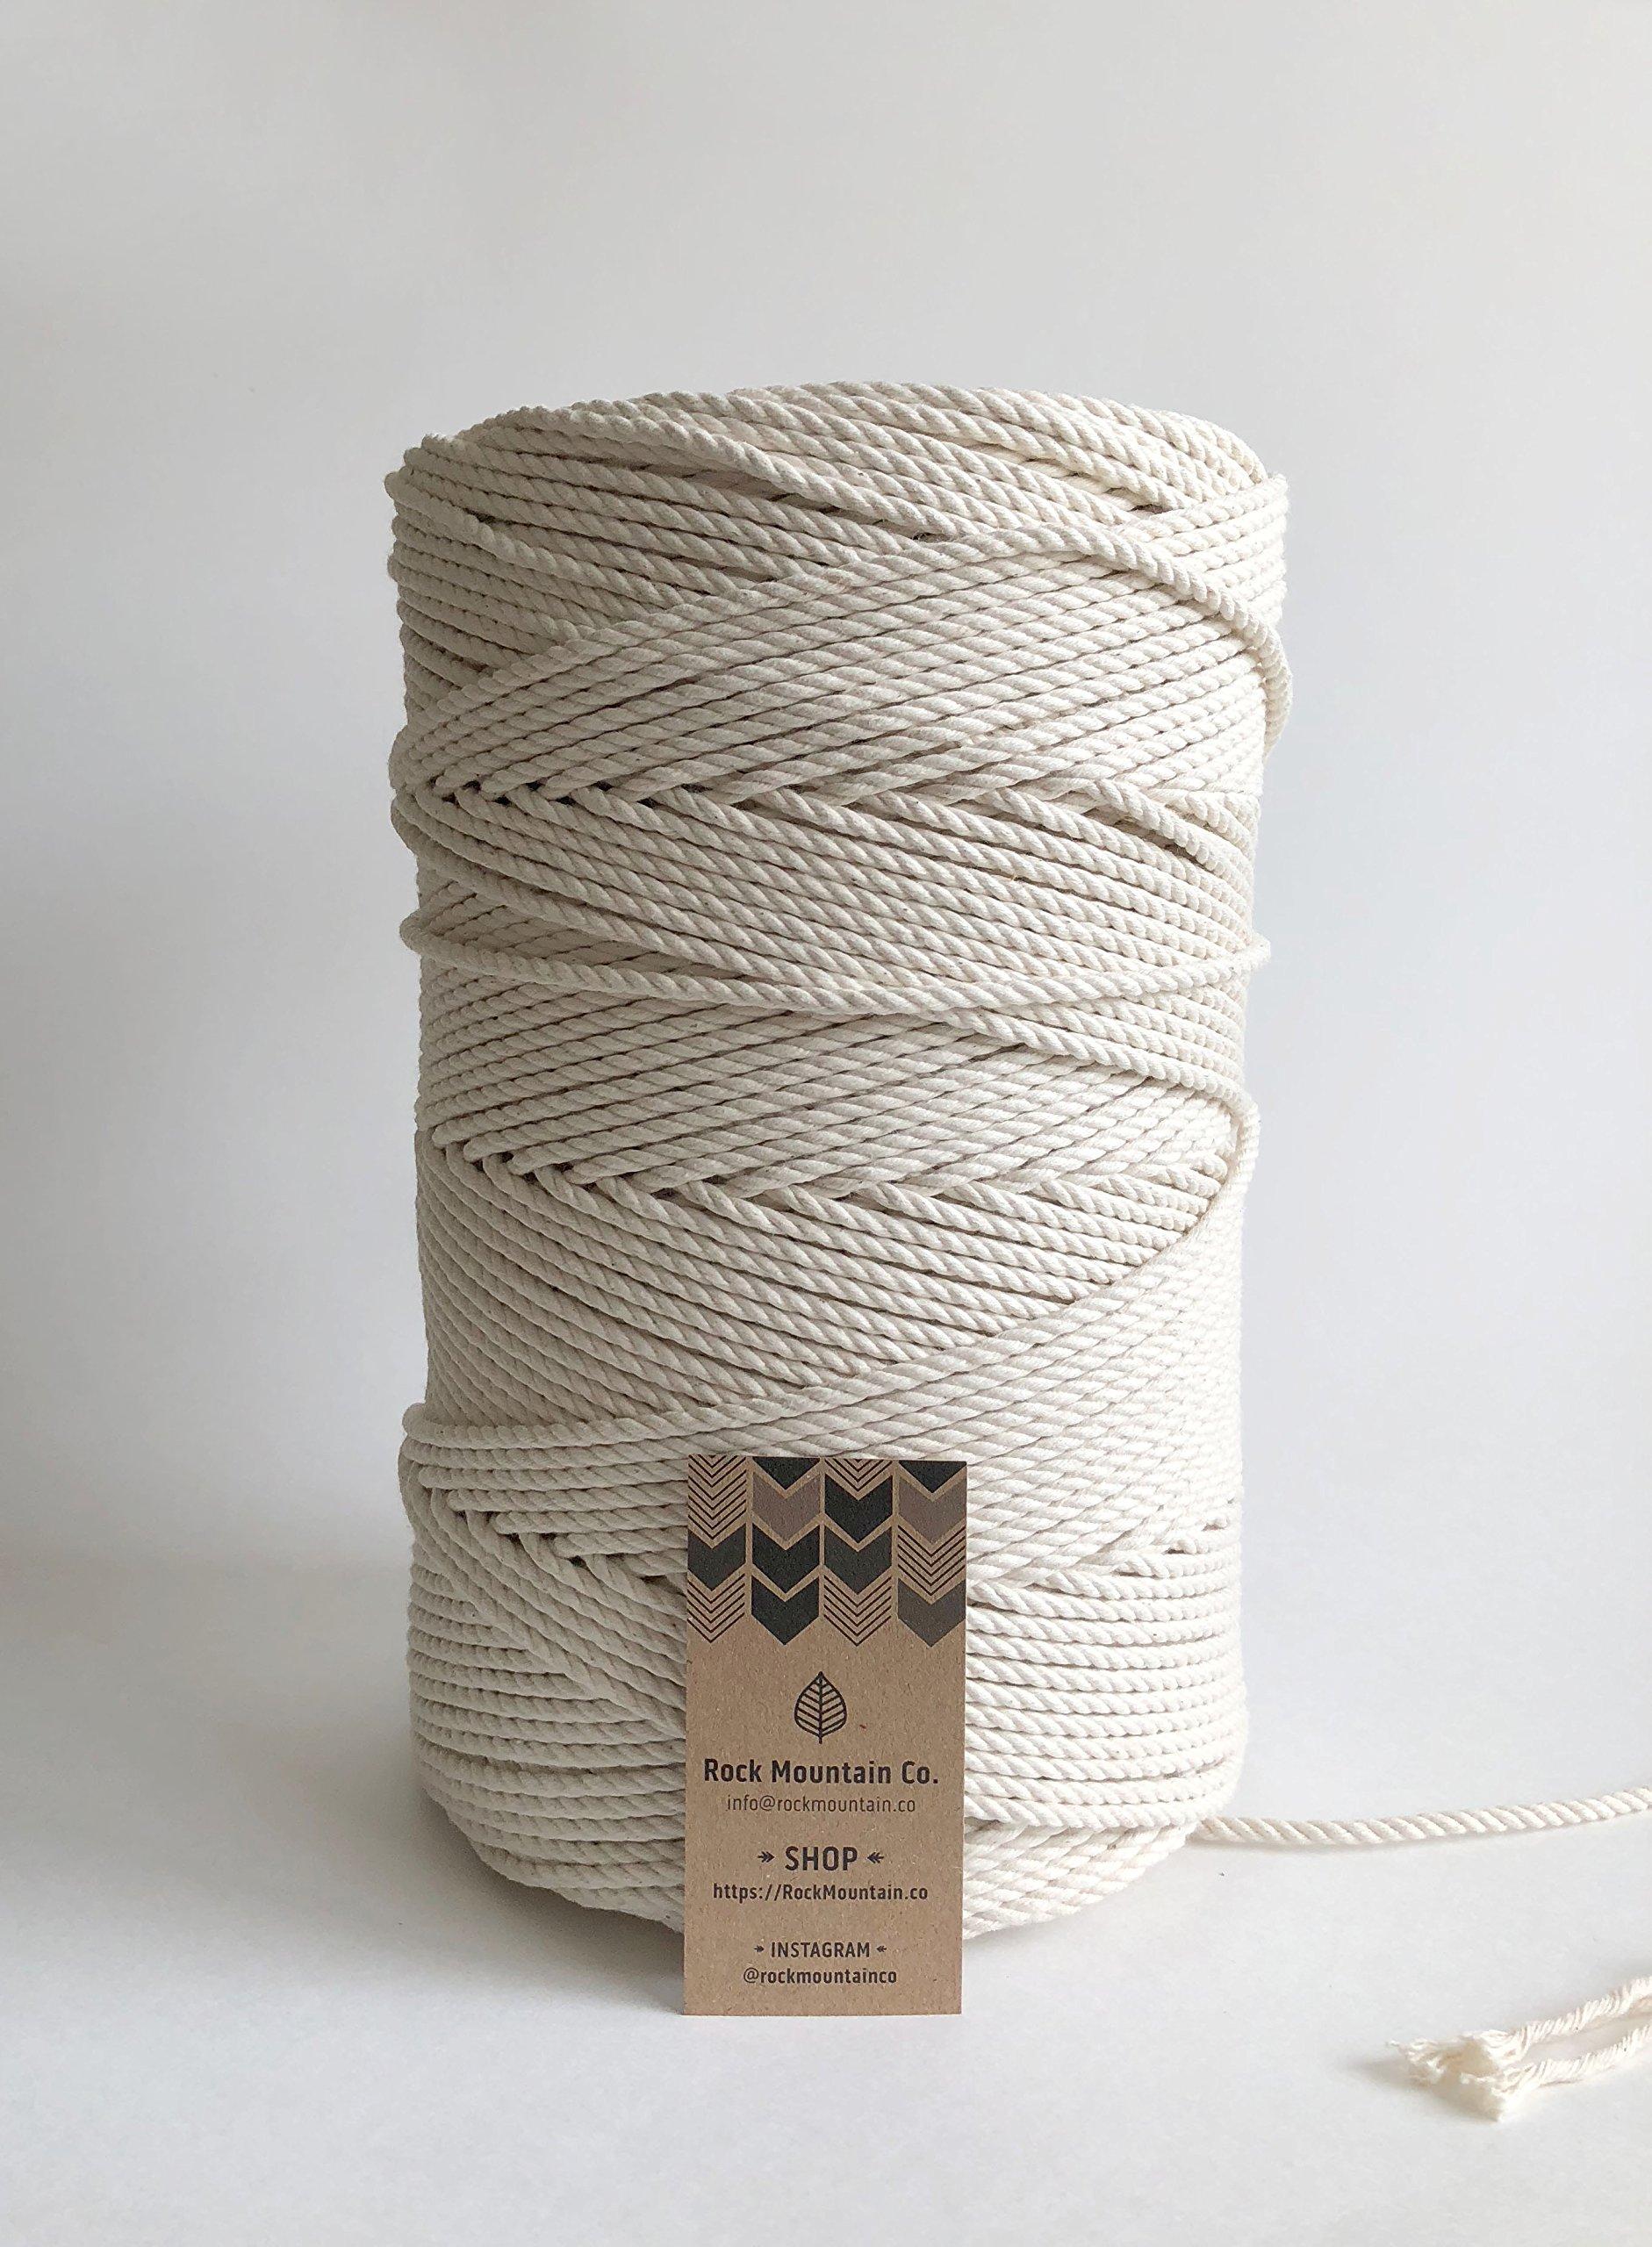 4mm Cotton Macrame Rope/1/8 Bulk Decorative Cord/3 ply 3 Strand/1200' Large Spool